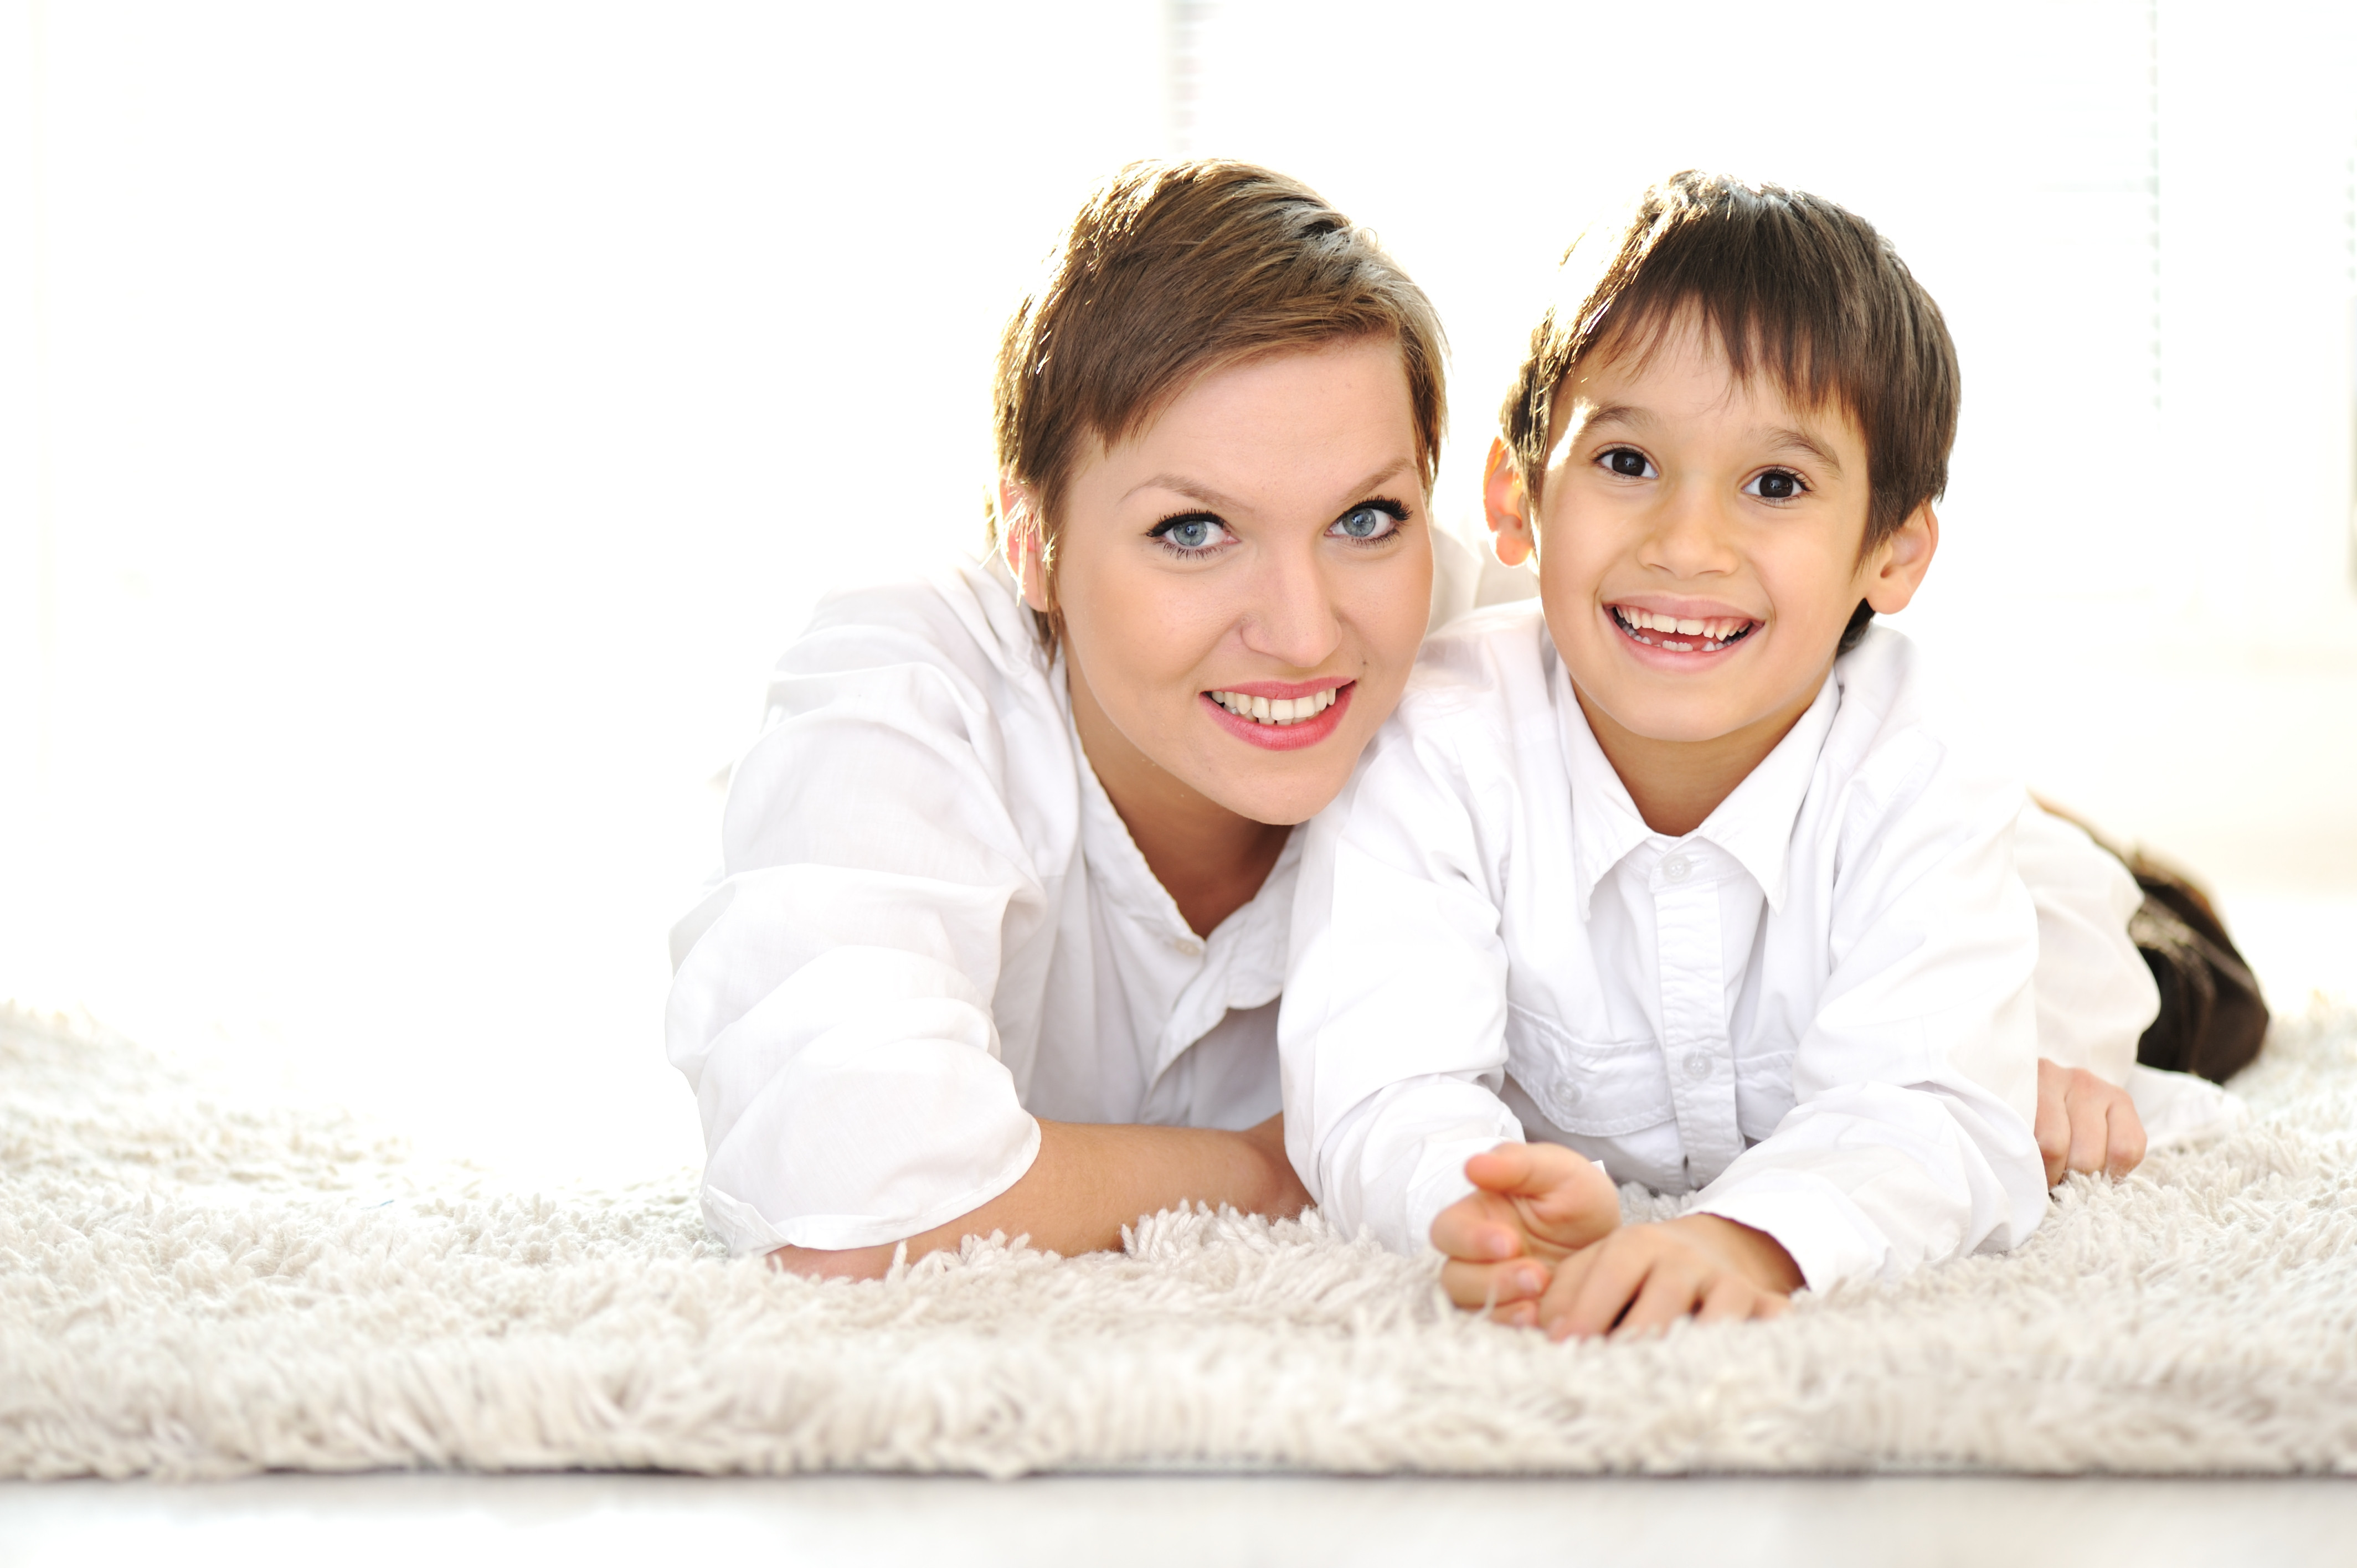 Carpet Clean 3 Rooms